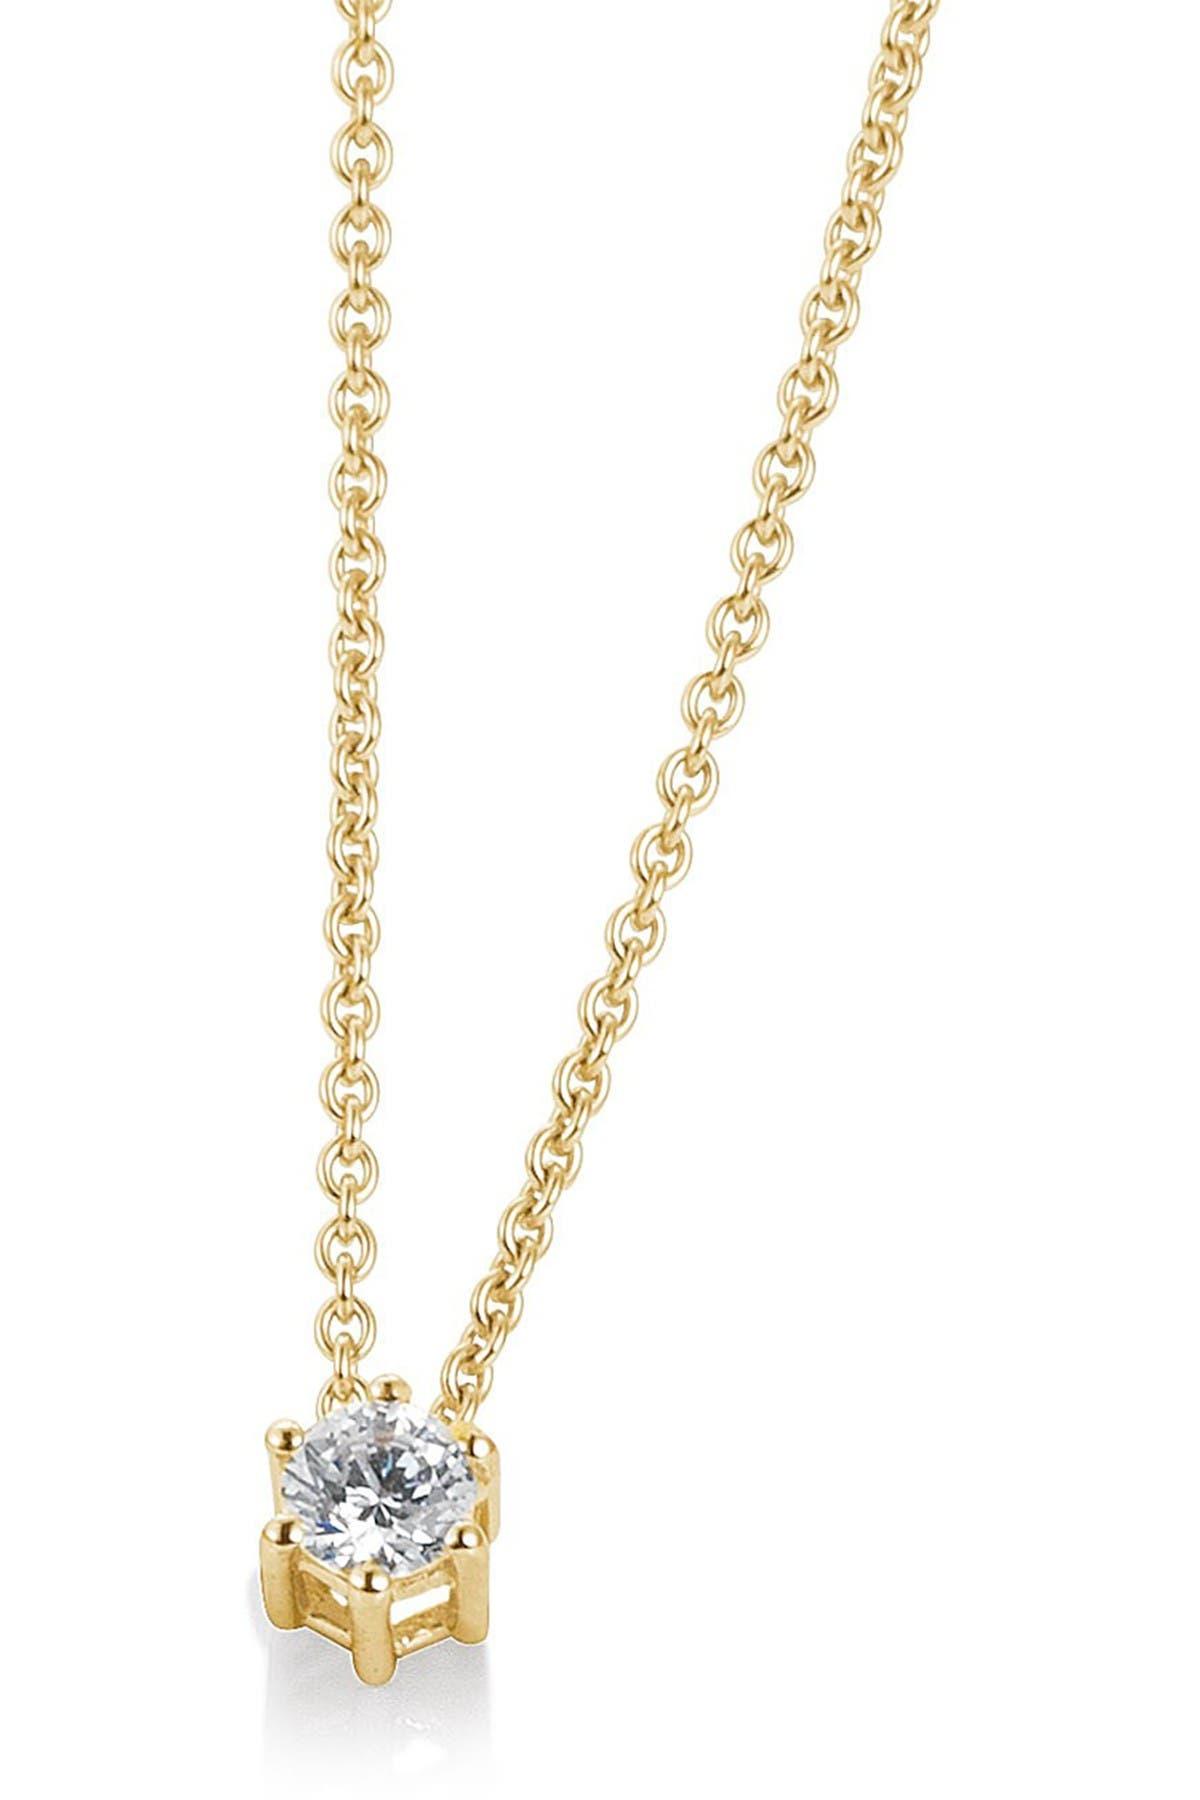 BREUNING 14K Gold Diamond Solitaire Pendant Necklace - 0.10 ctw